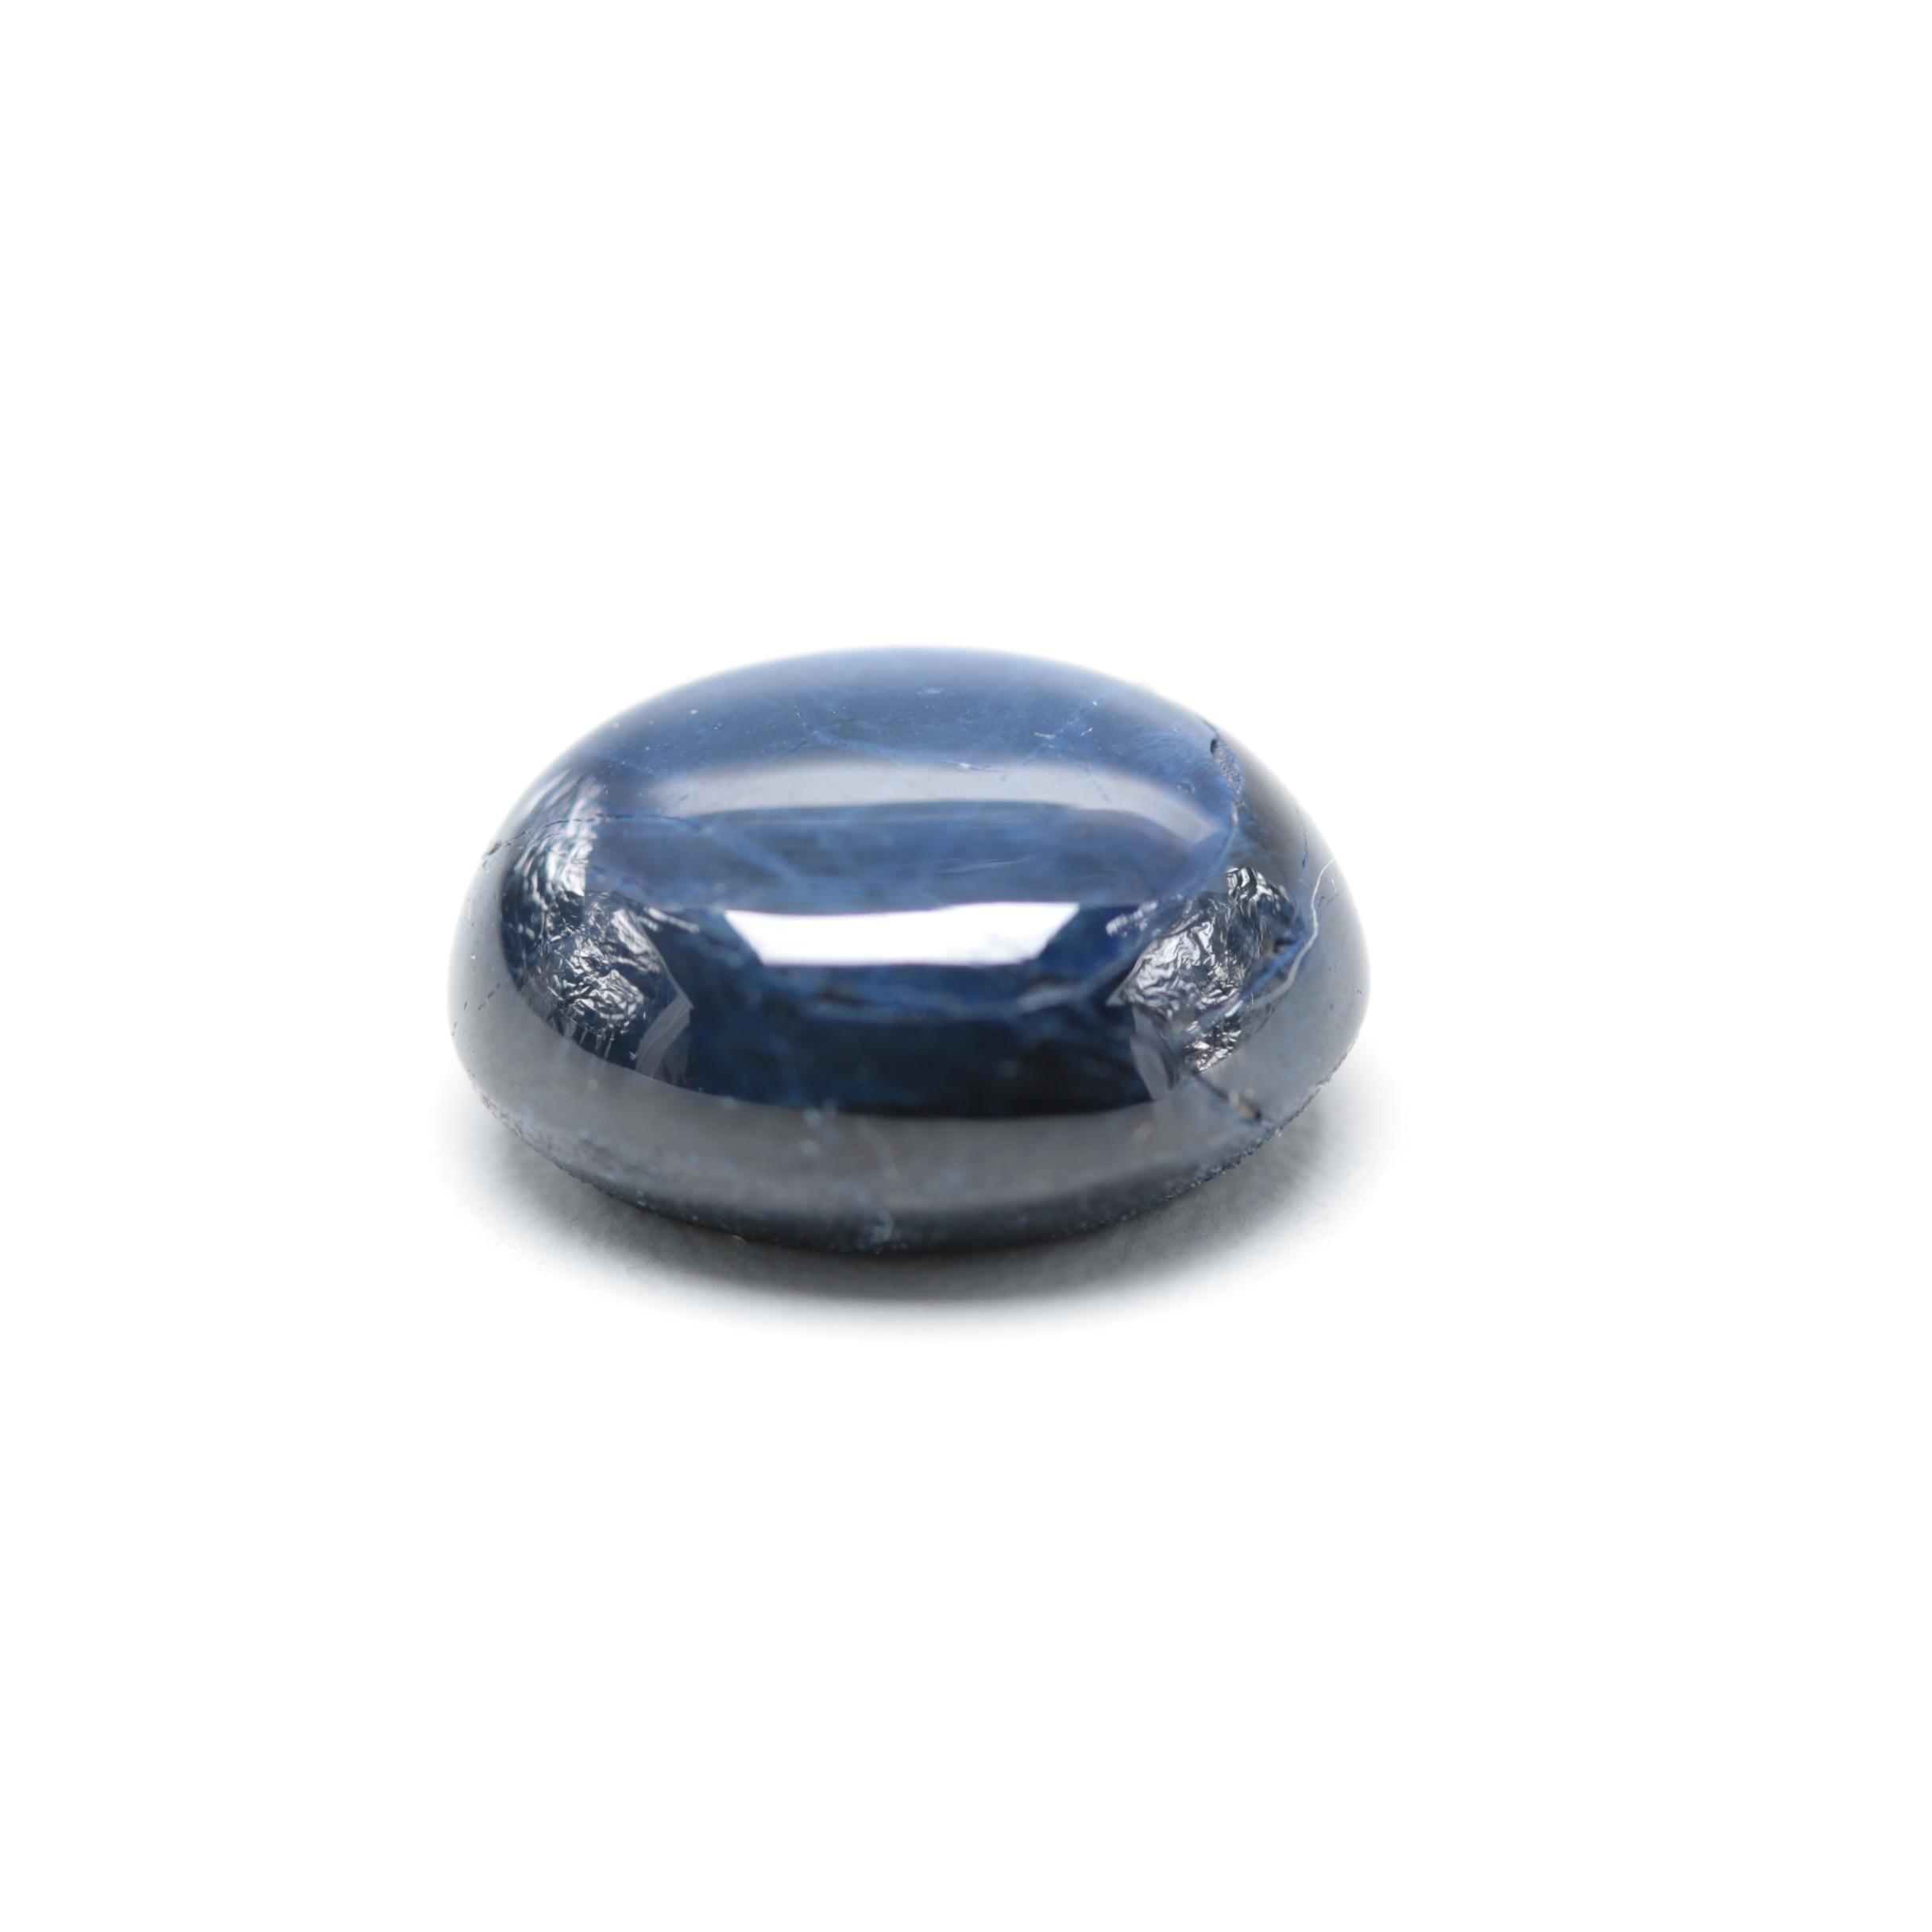 Loose 14.80 CT Star Sapphire